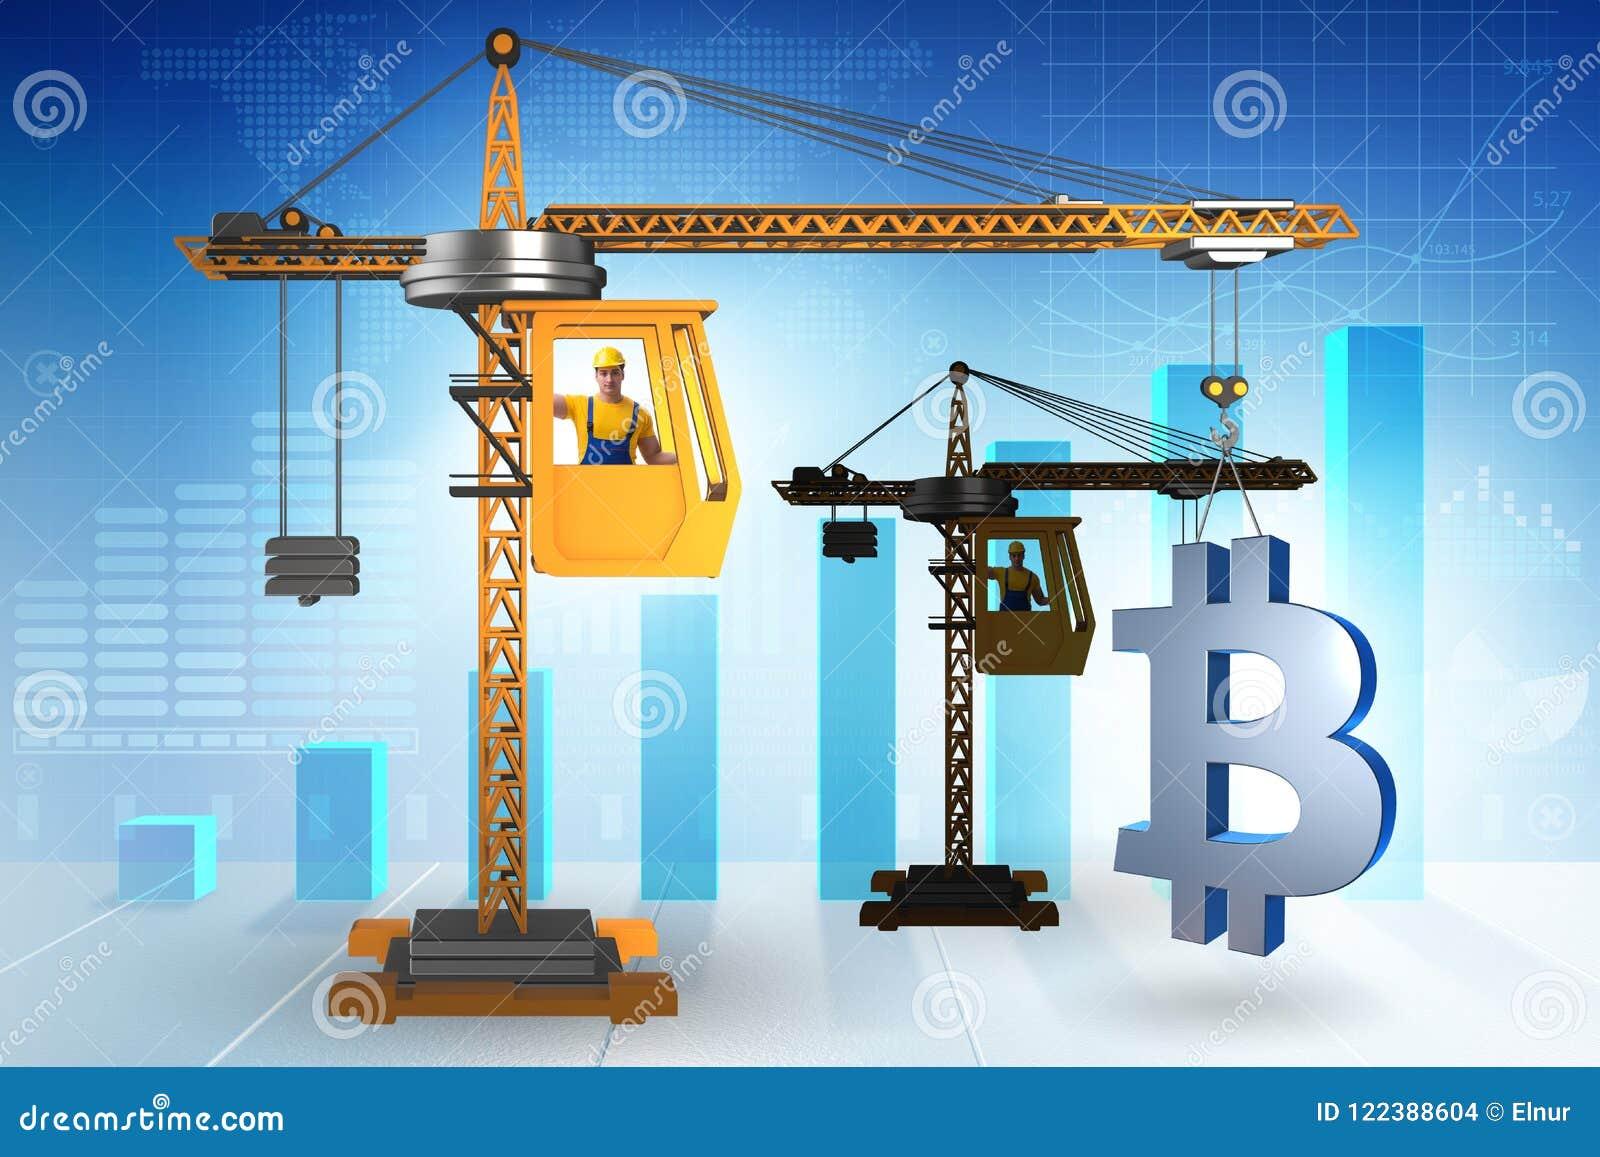 bitcoin crane